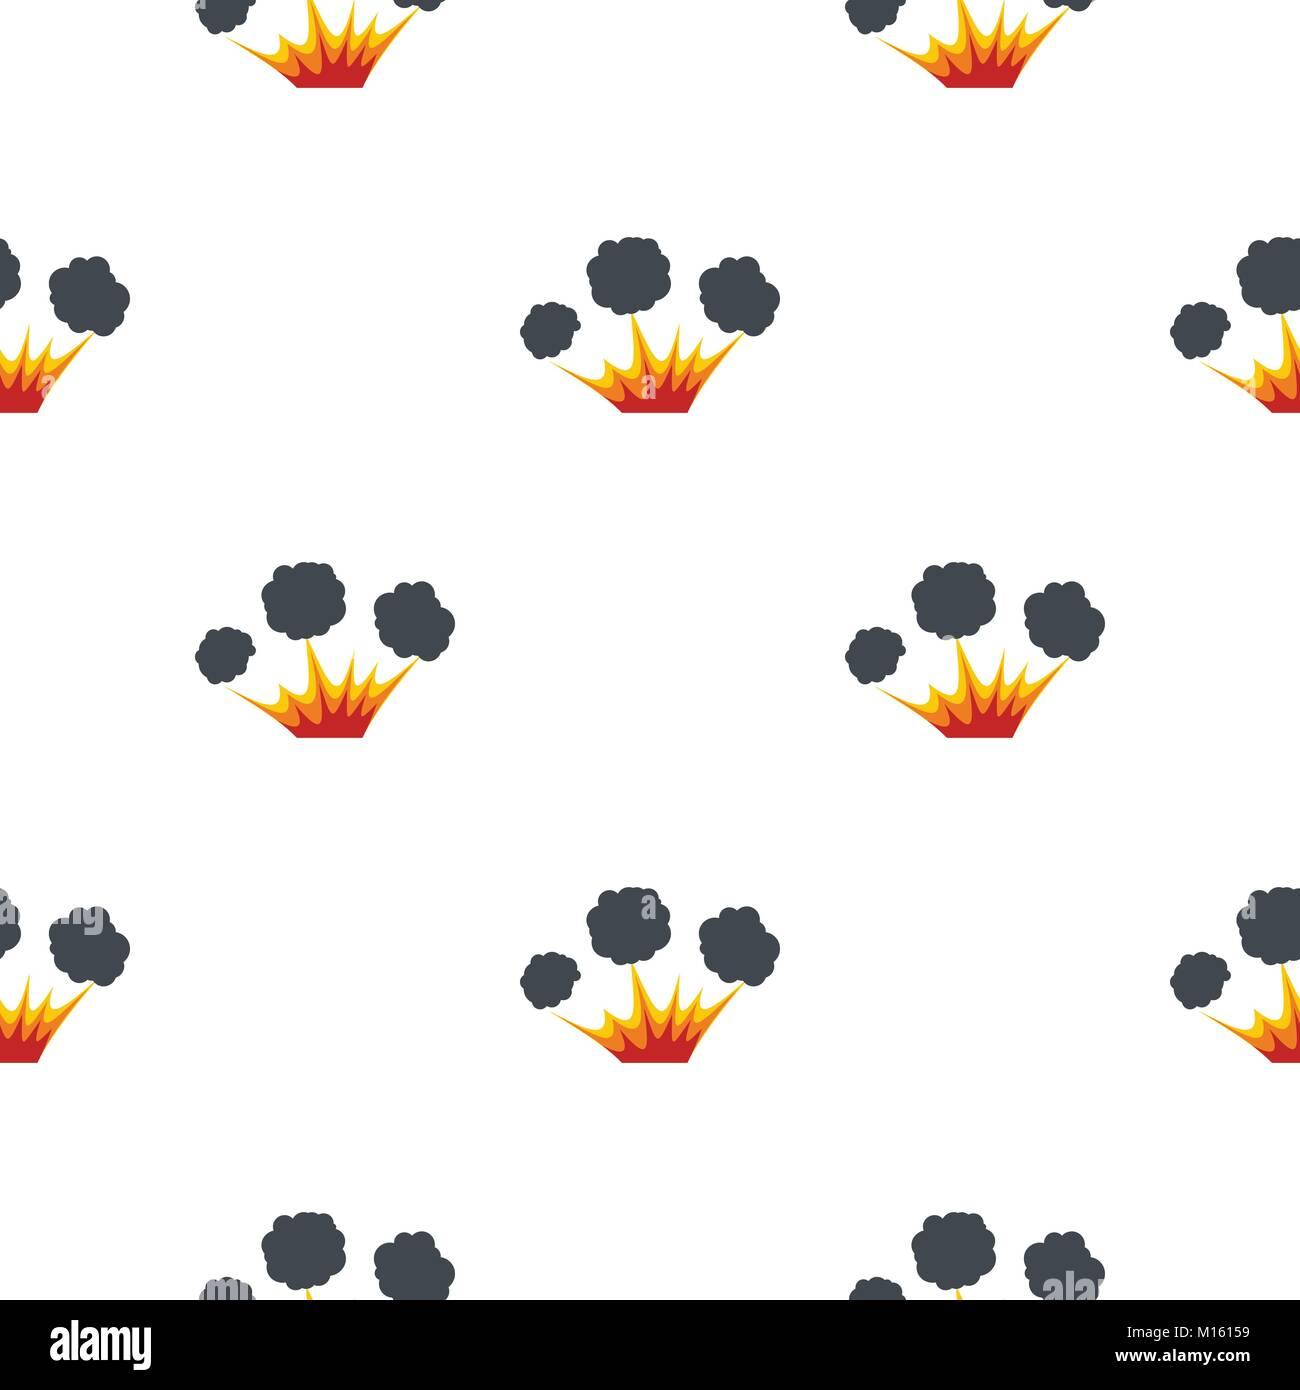 Explosion pattern seamless - Stock Image